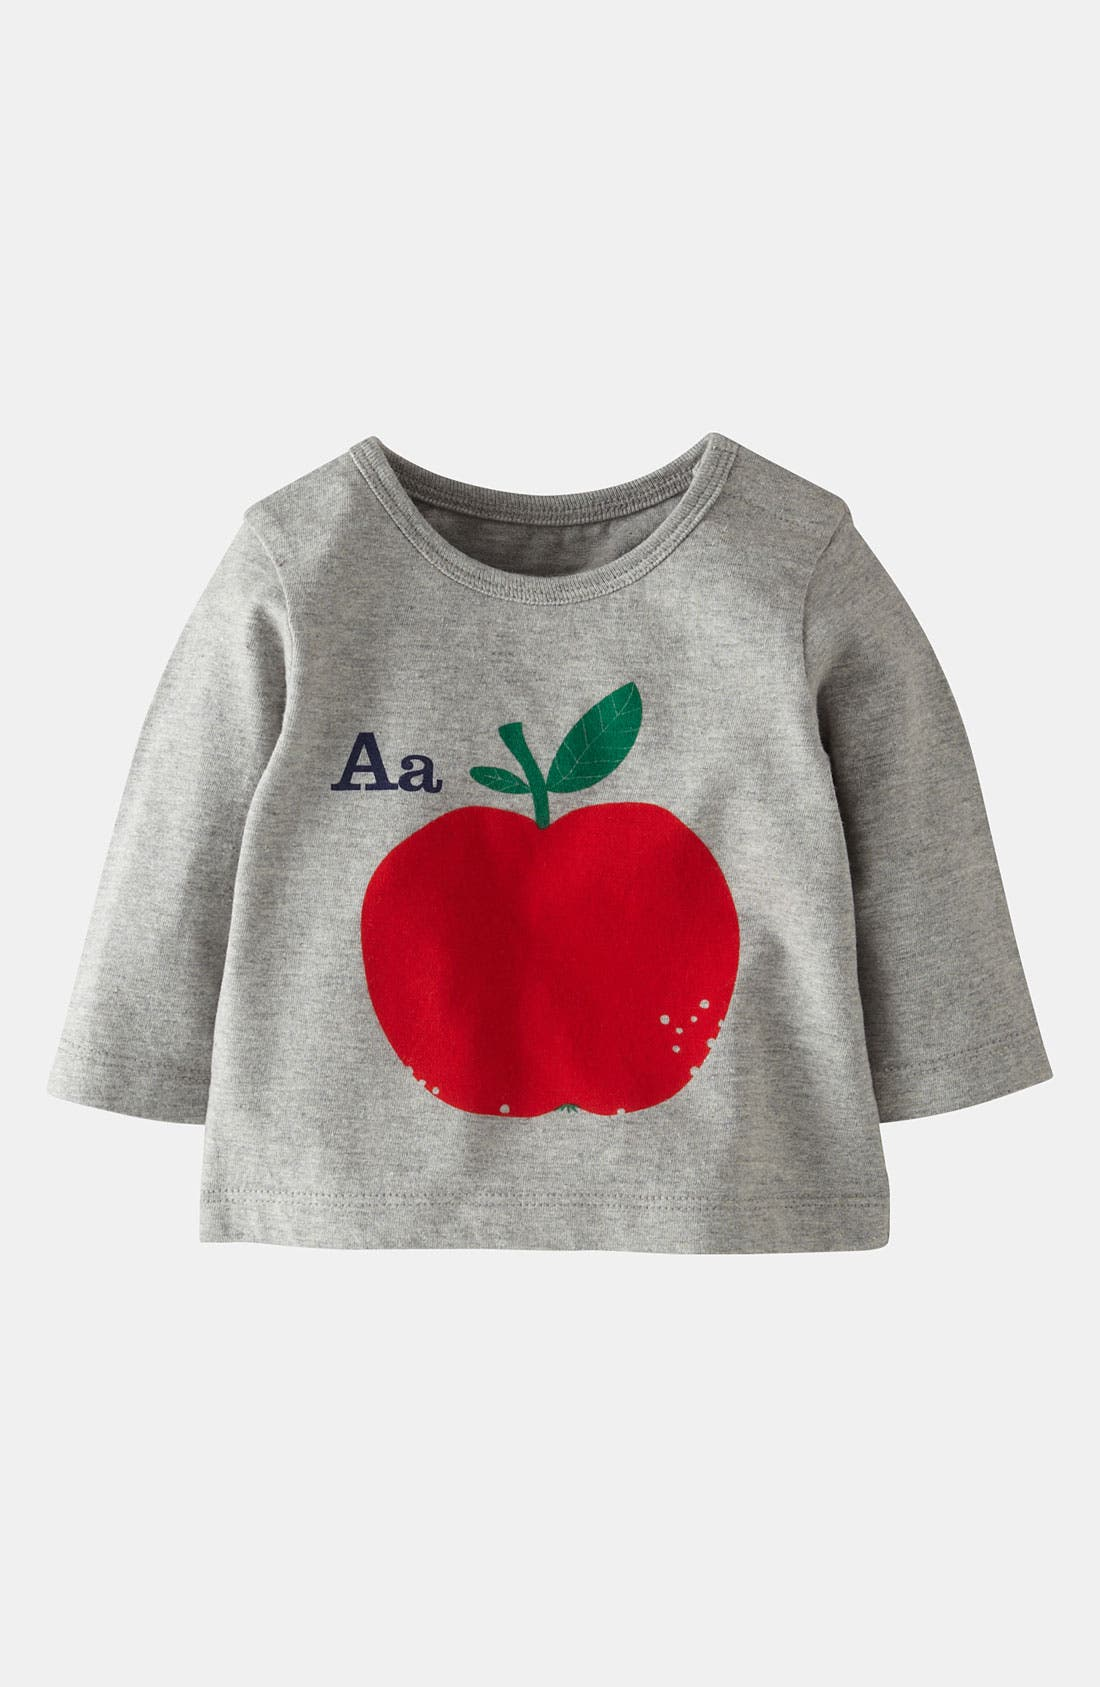 Alternate Image 1 Selected - Mini Boden 'Alphabet Print' T-Shirt (Infant)